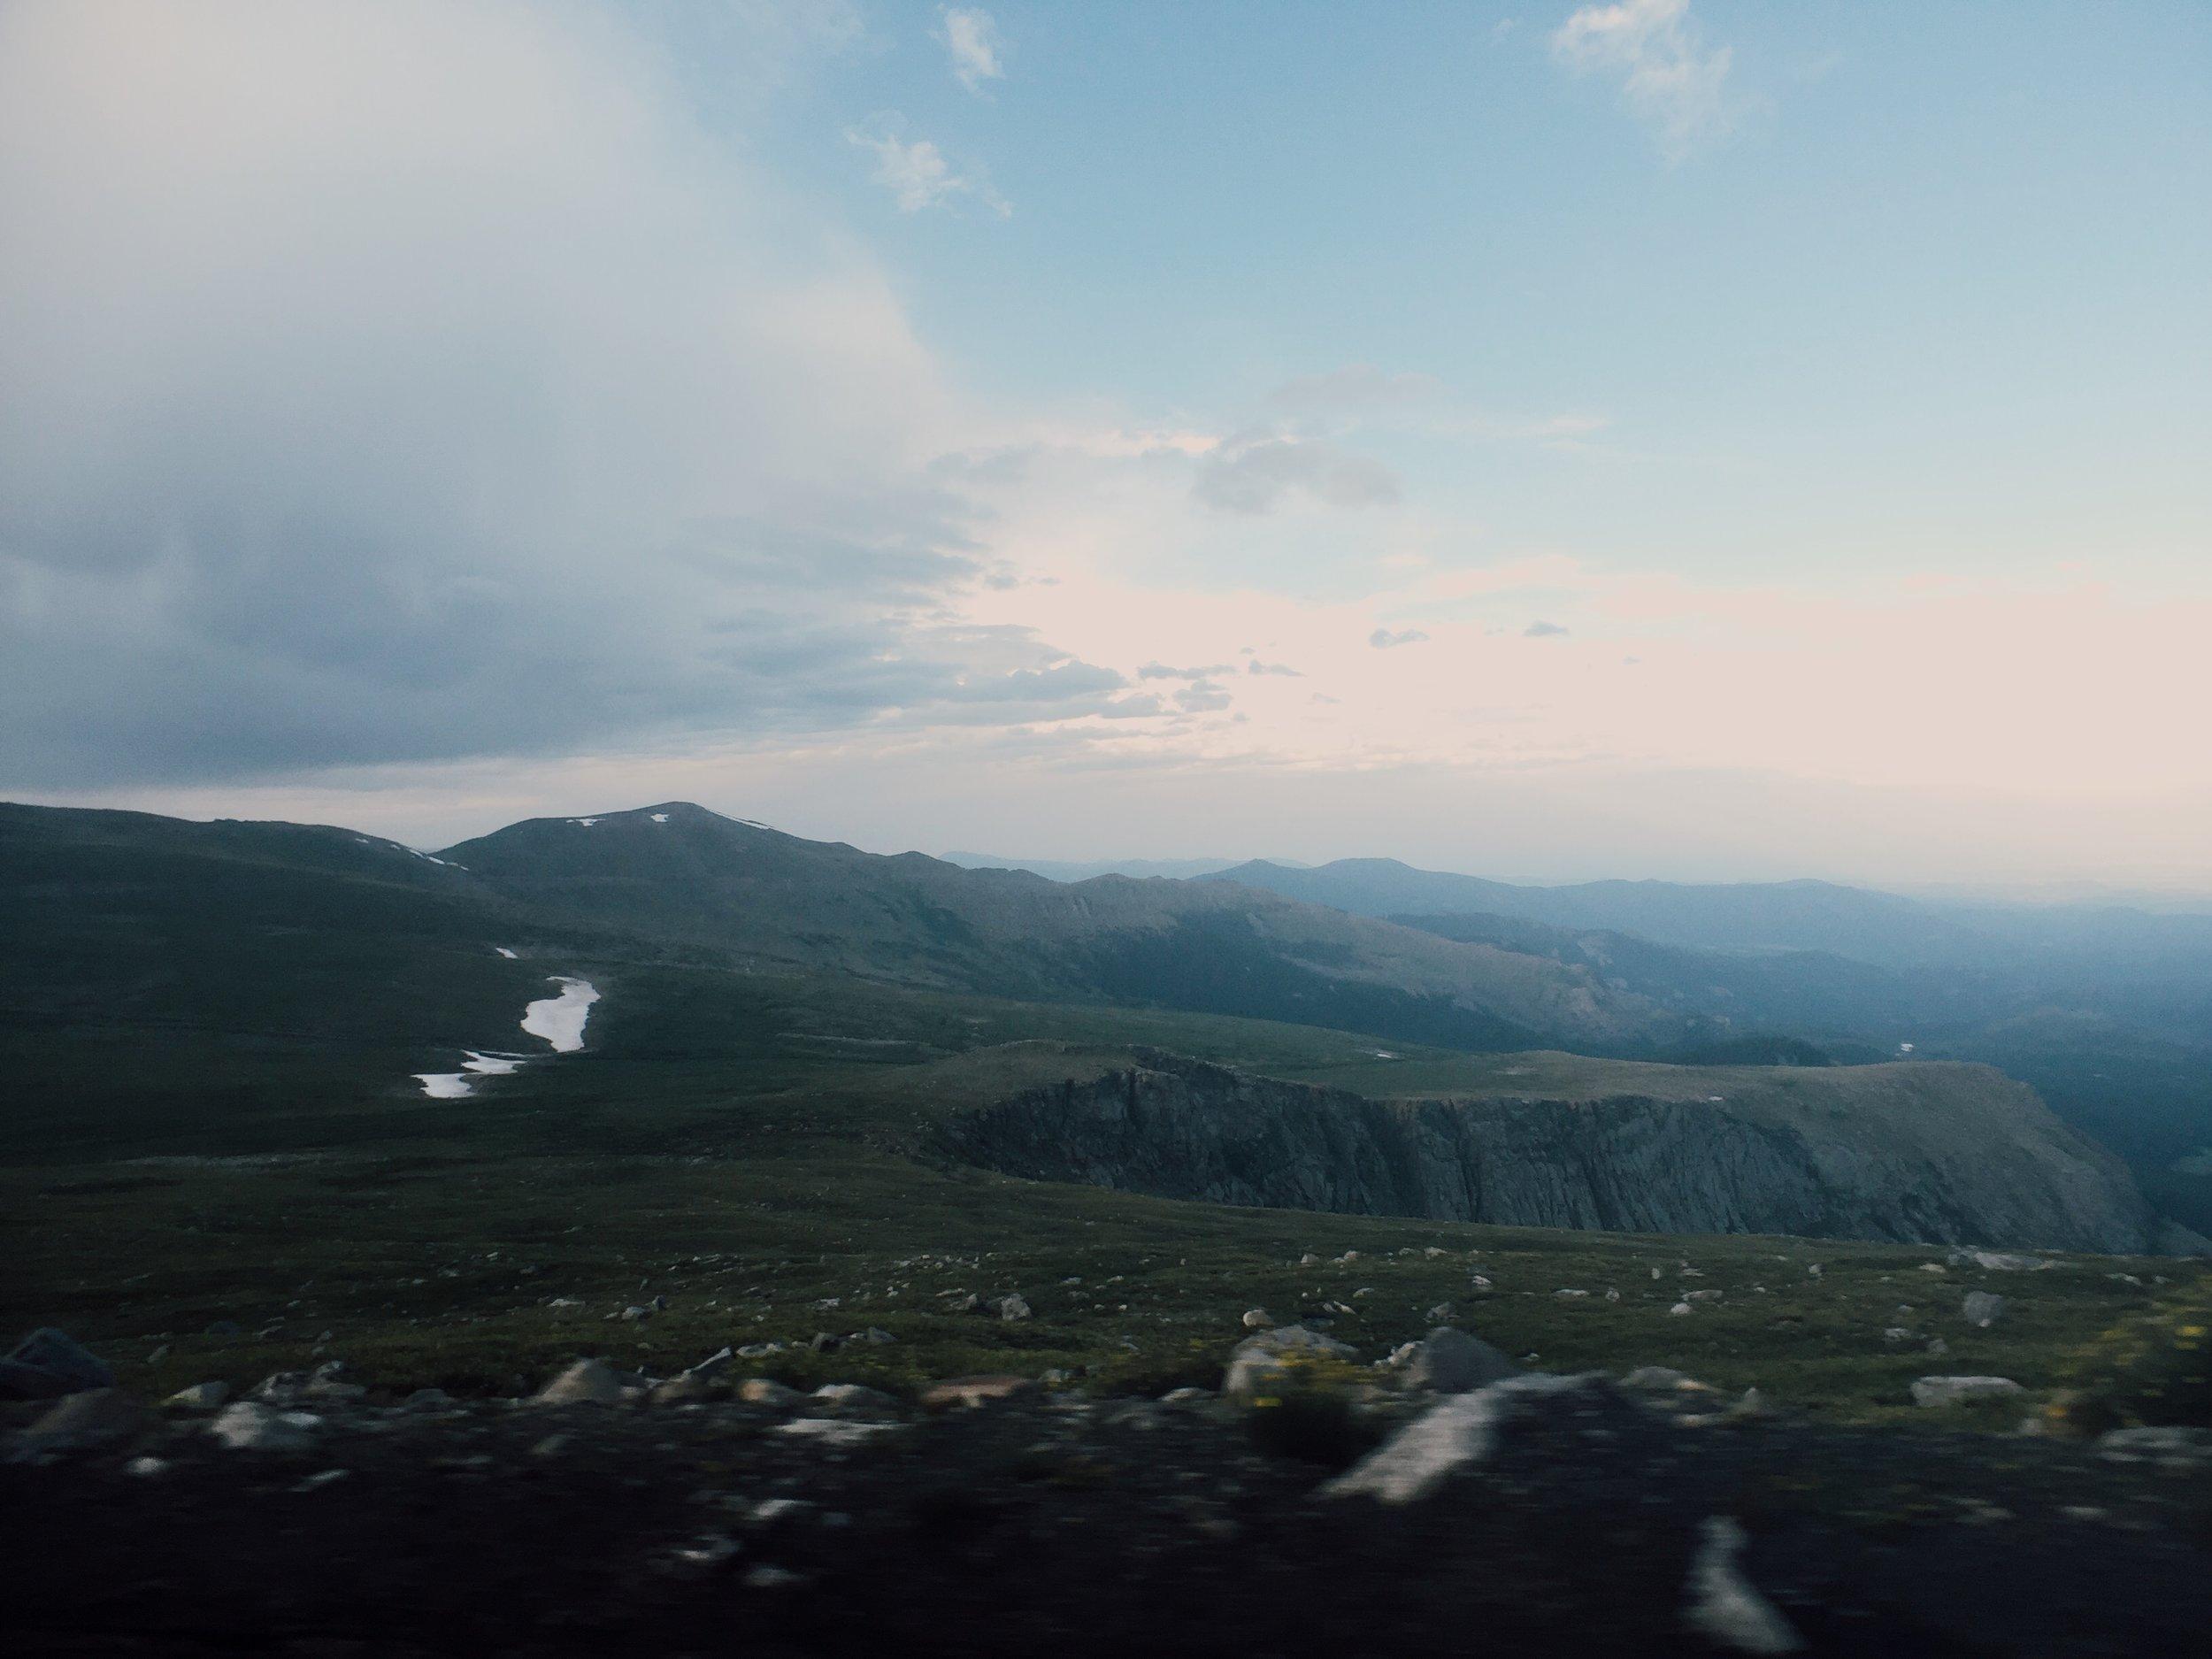 14,000 feet.